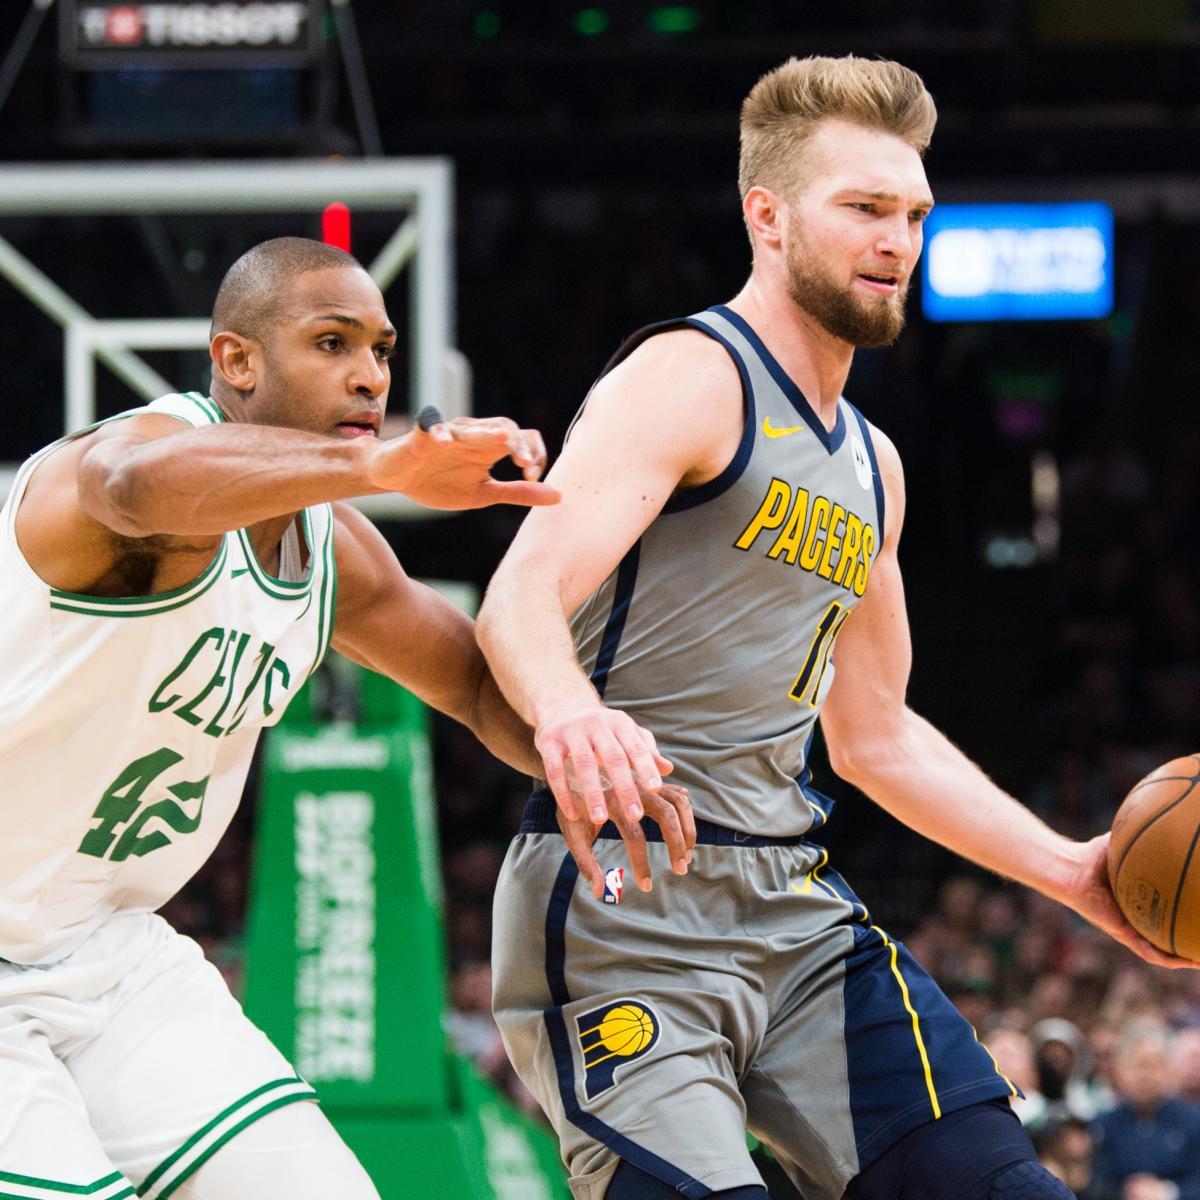 Latest News Updates: NBA Playoff Standings 2019: Updated Bracket, Matchups That